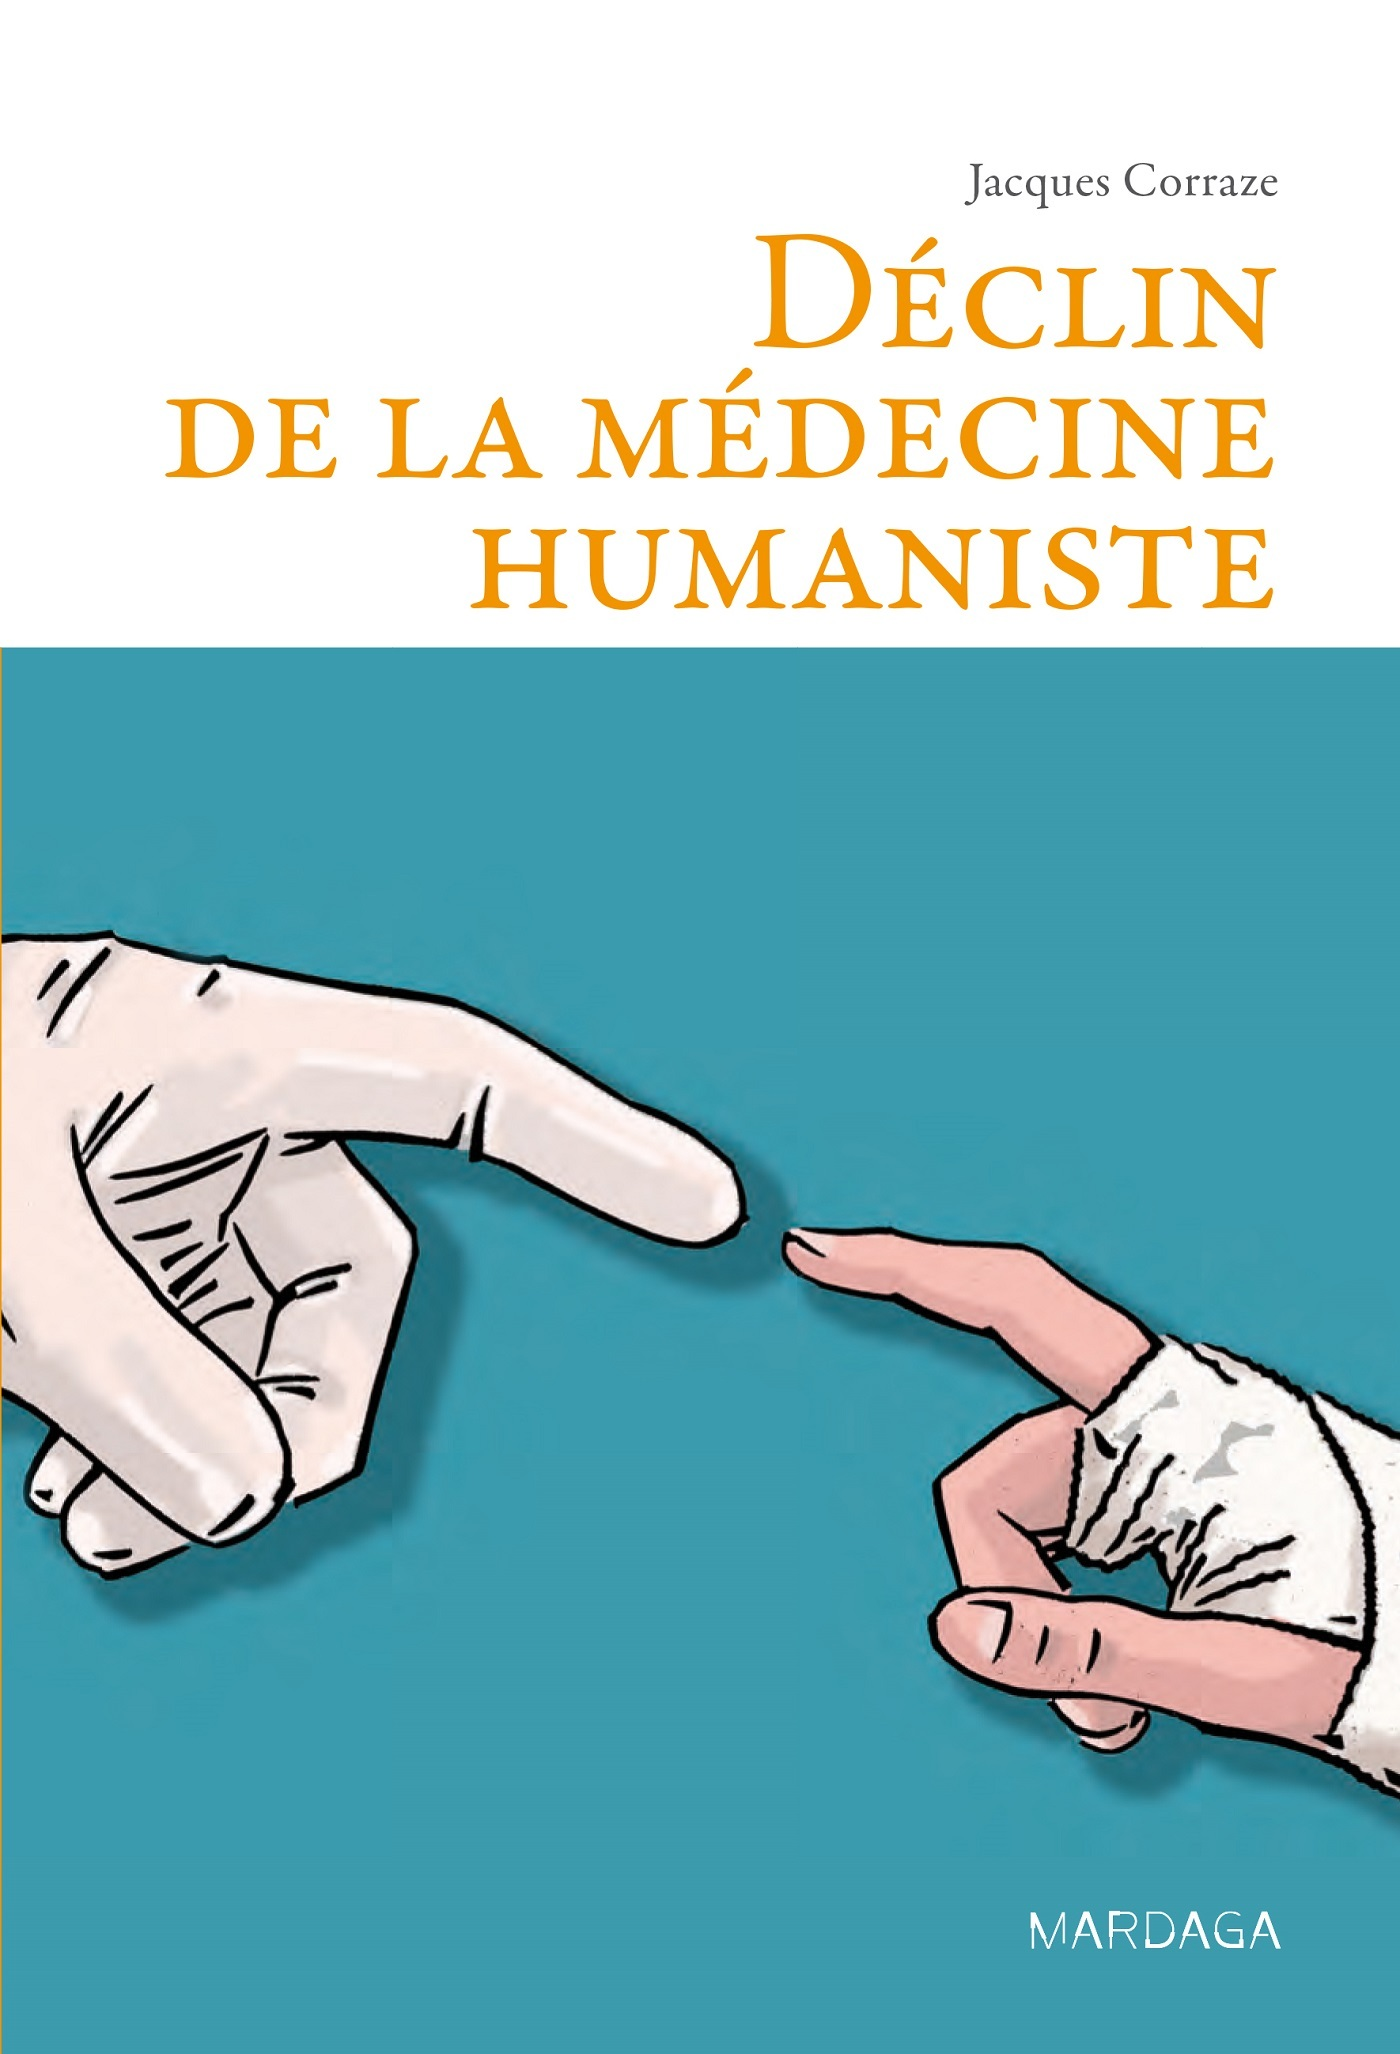 DECLIN DE LA MEDECINE HUMANISTE